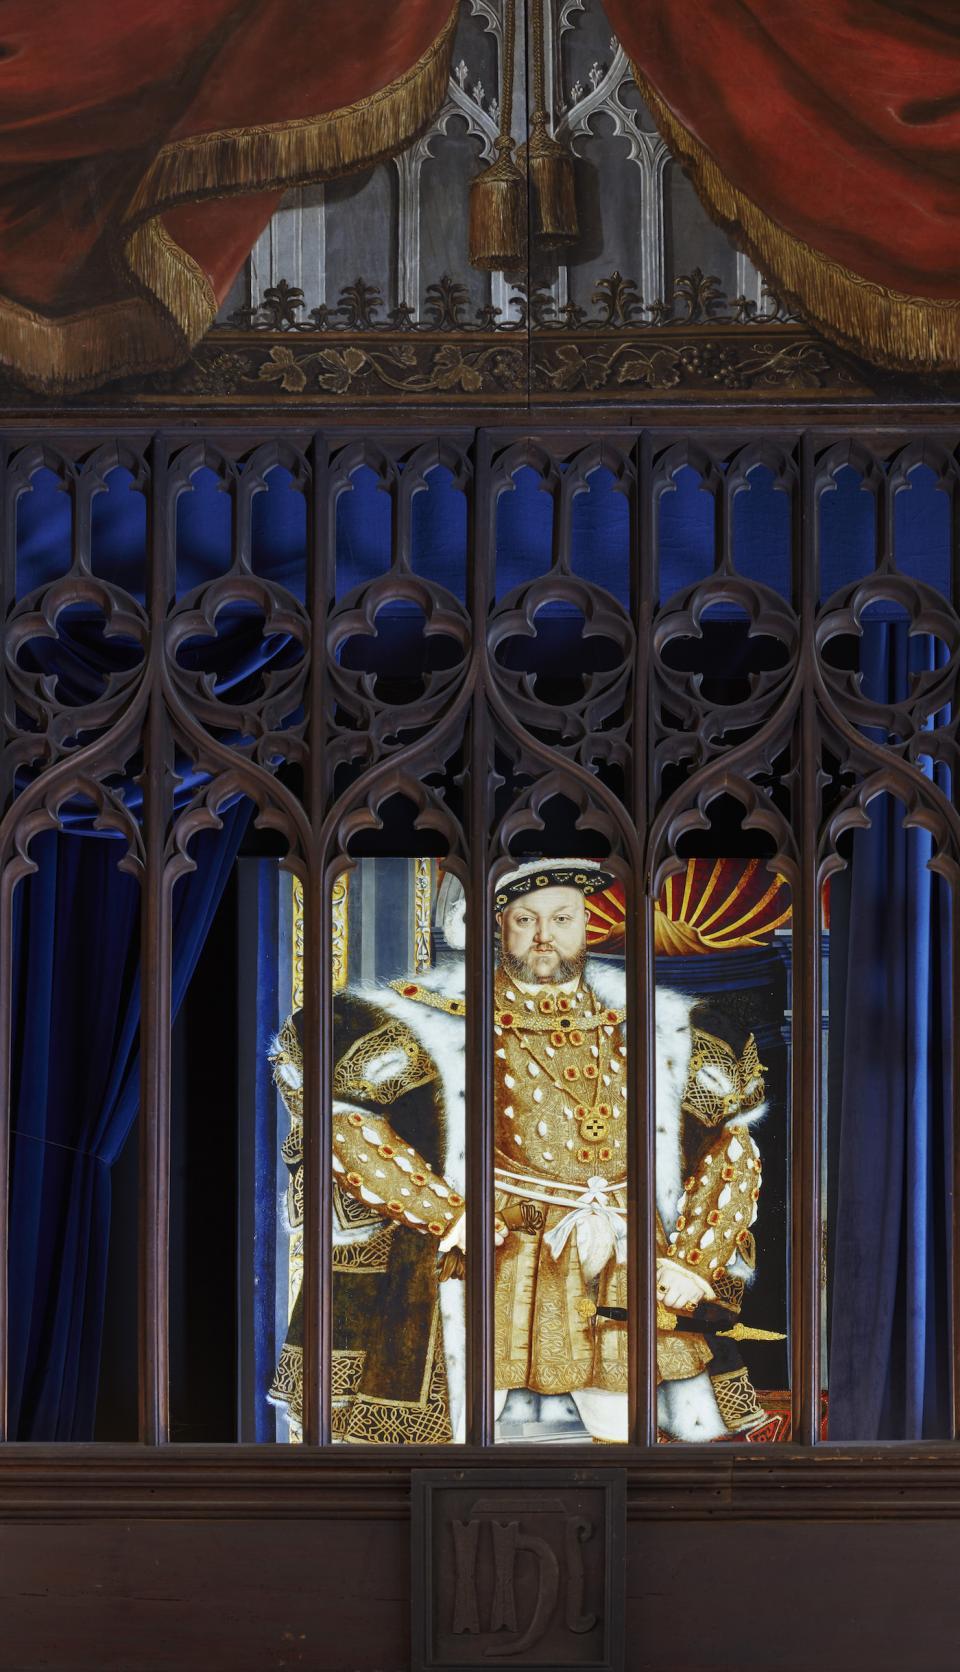 The Vyne - illuminated image of Henry VIII cDennis Gilbert